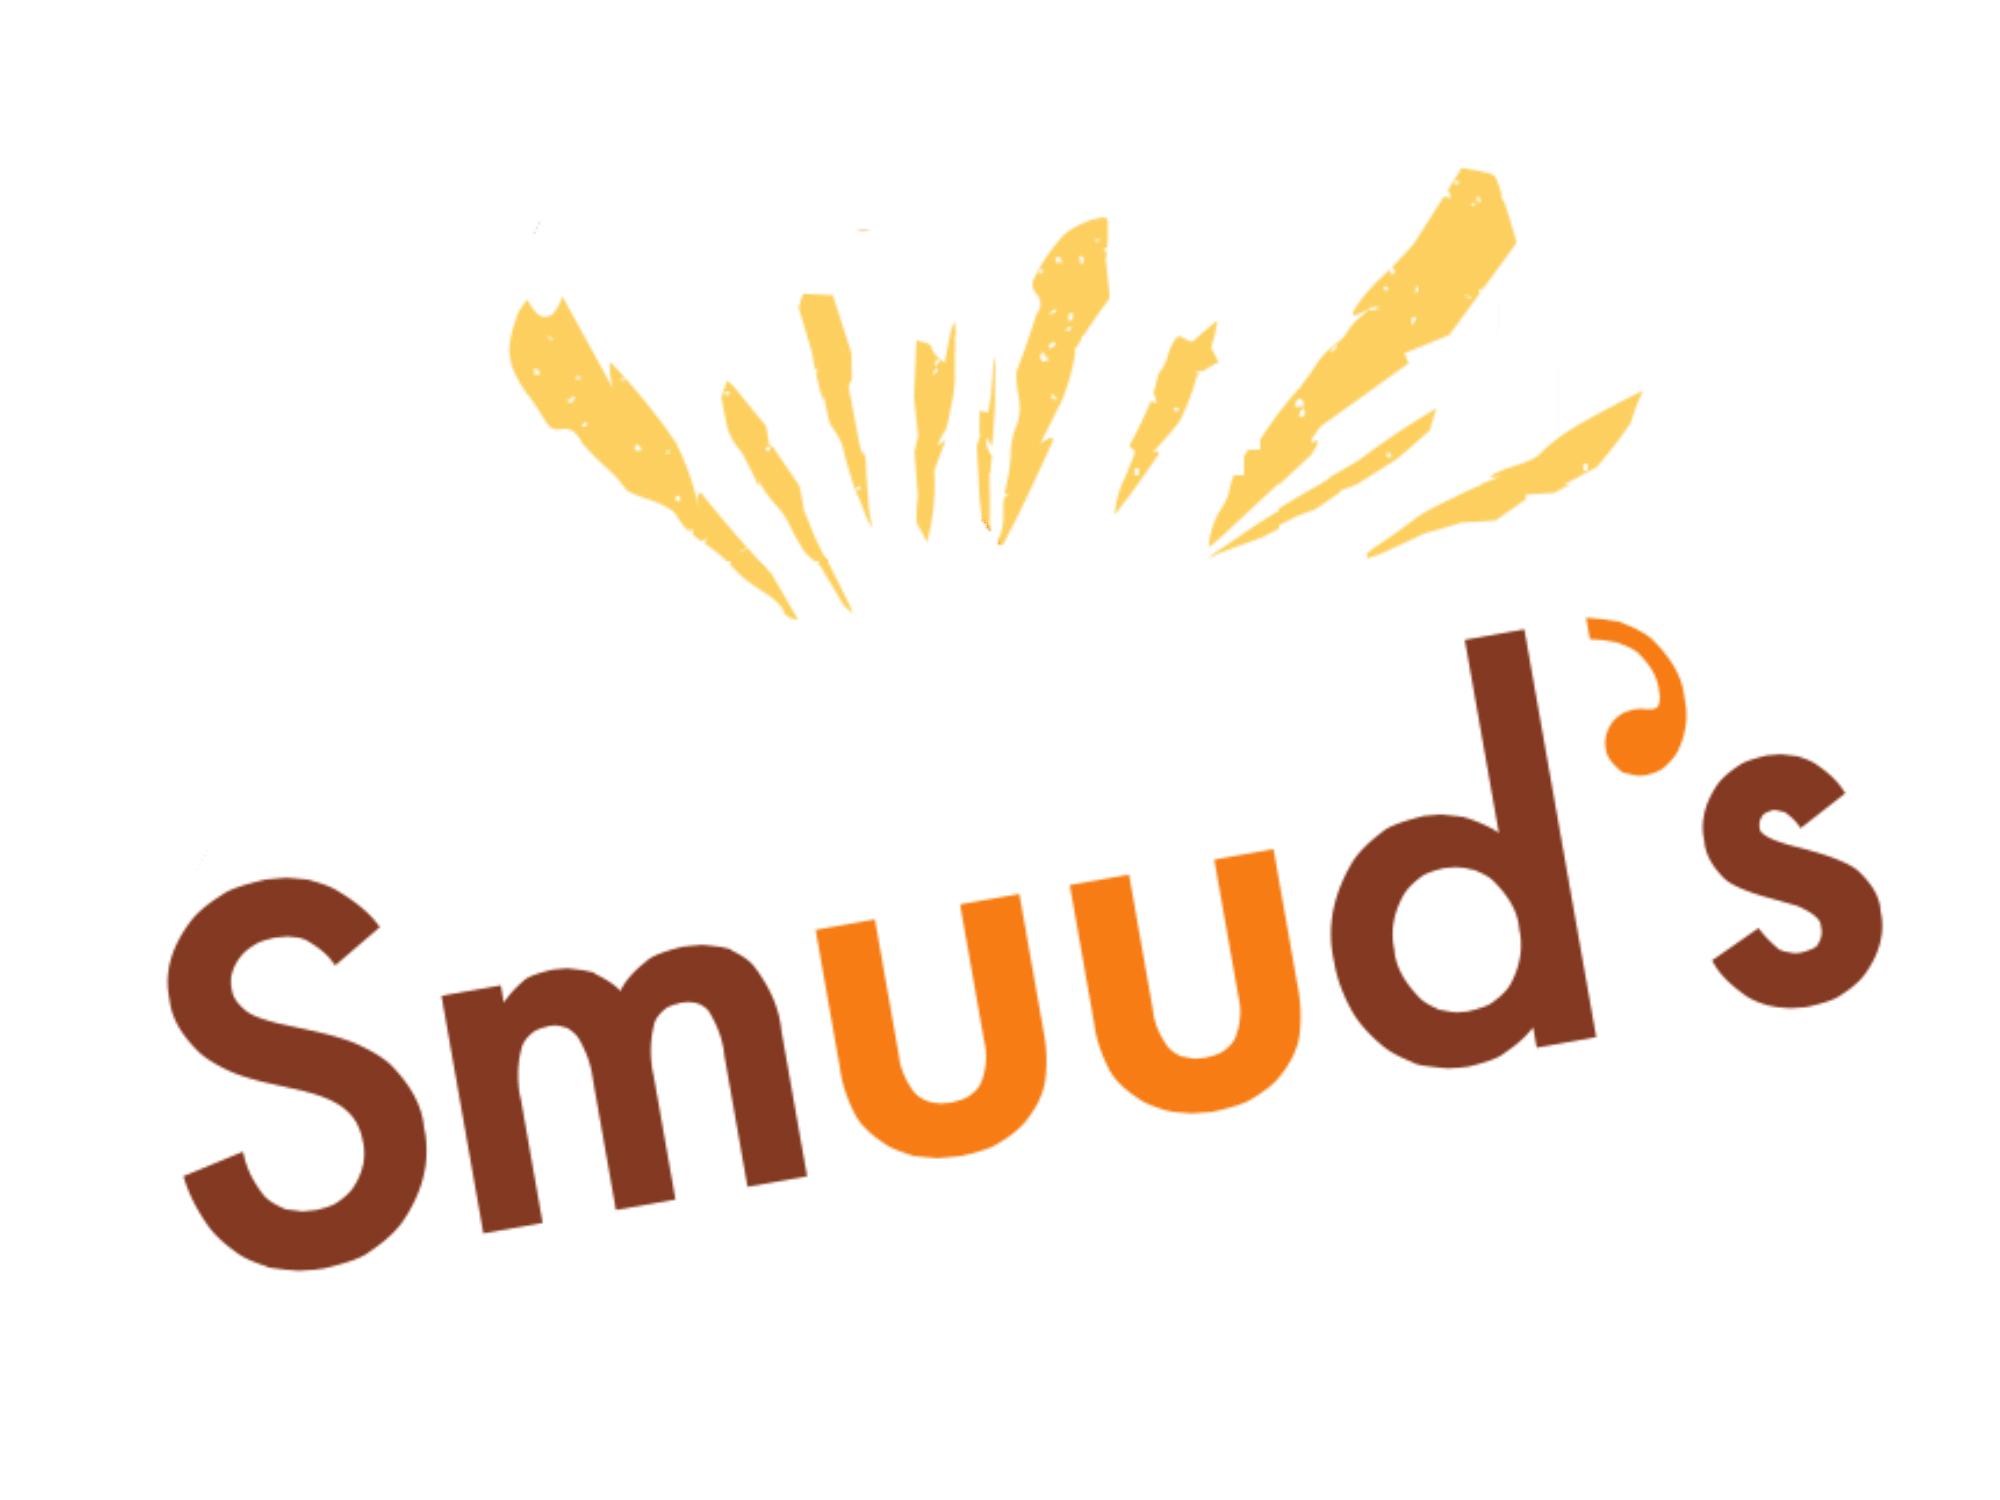 Smuud's